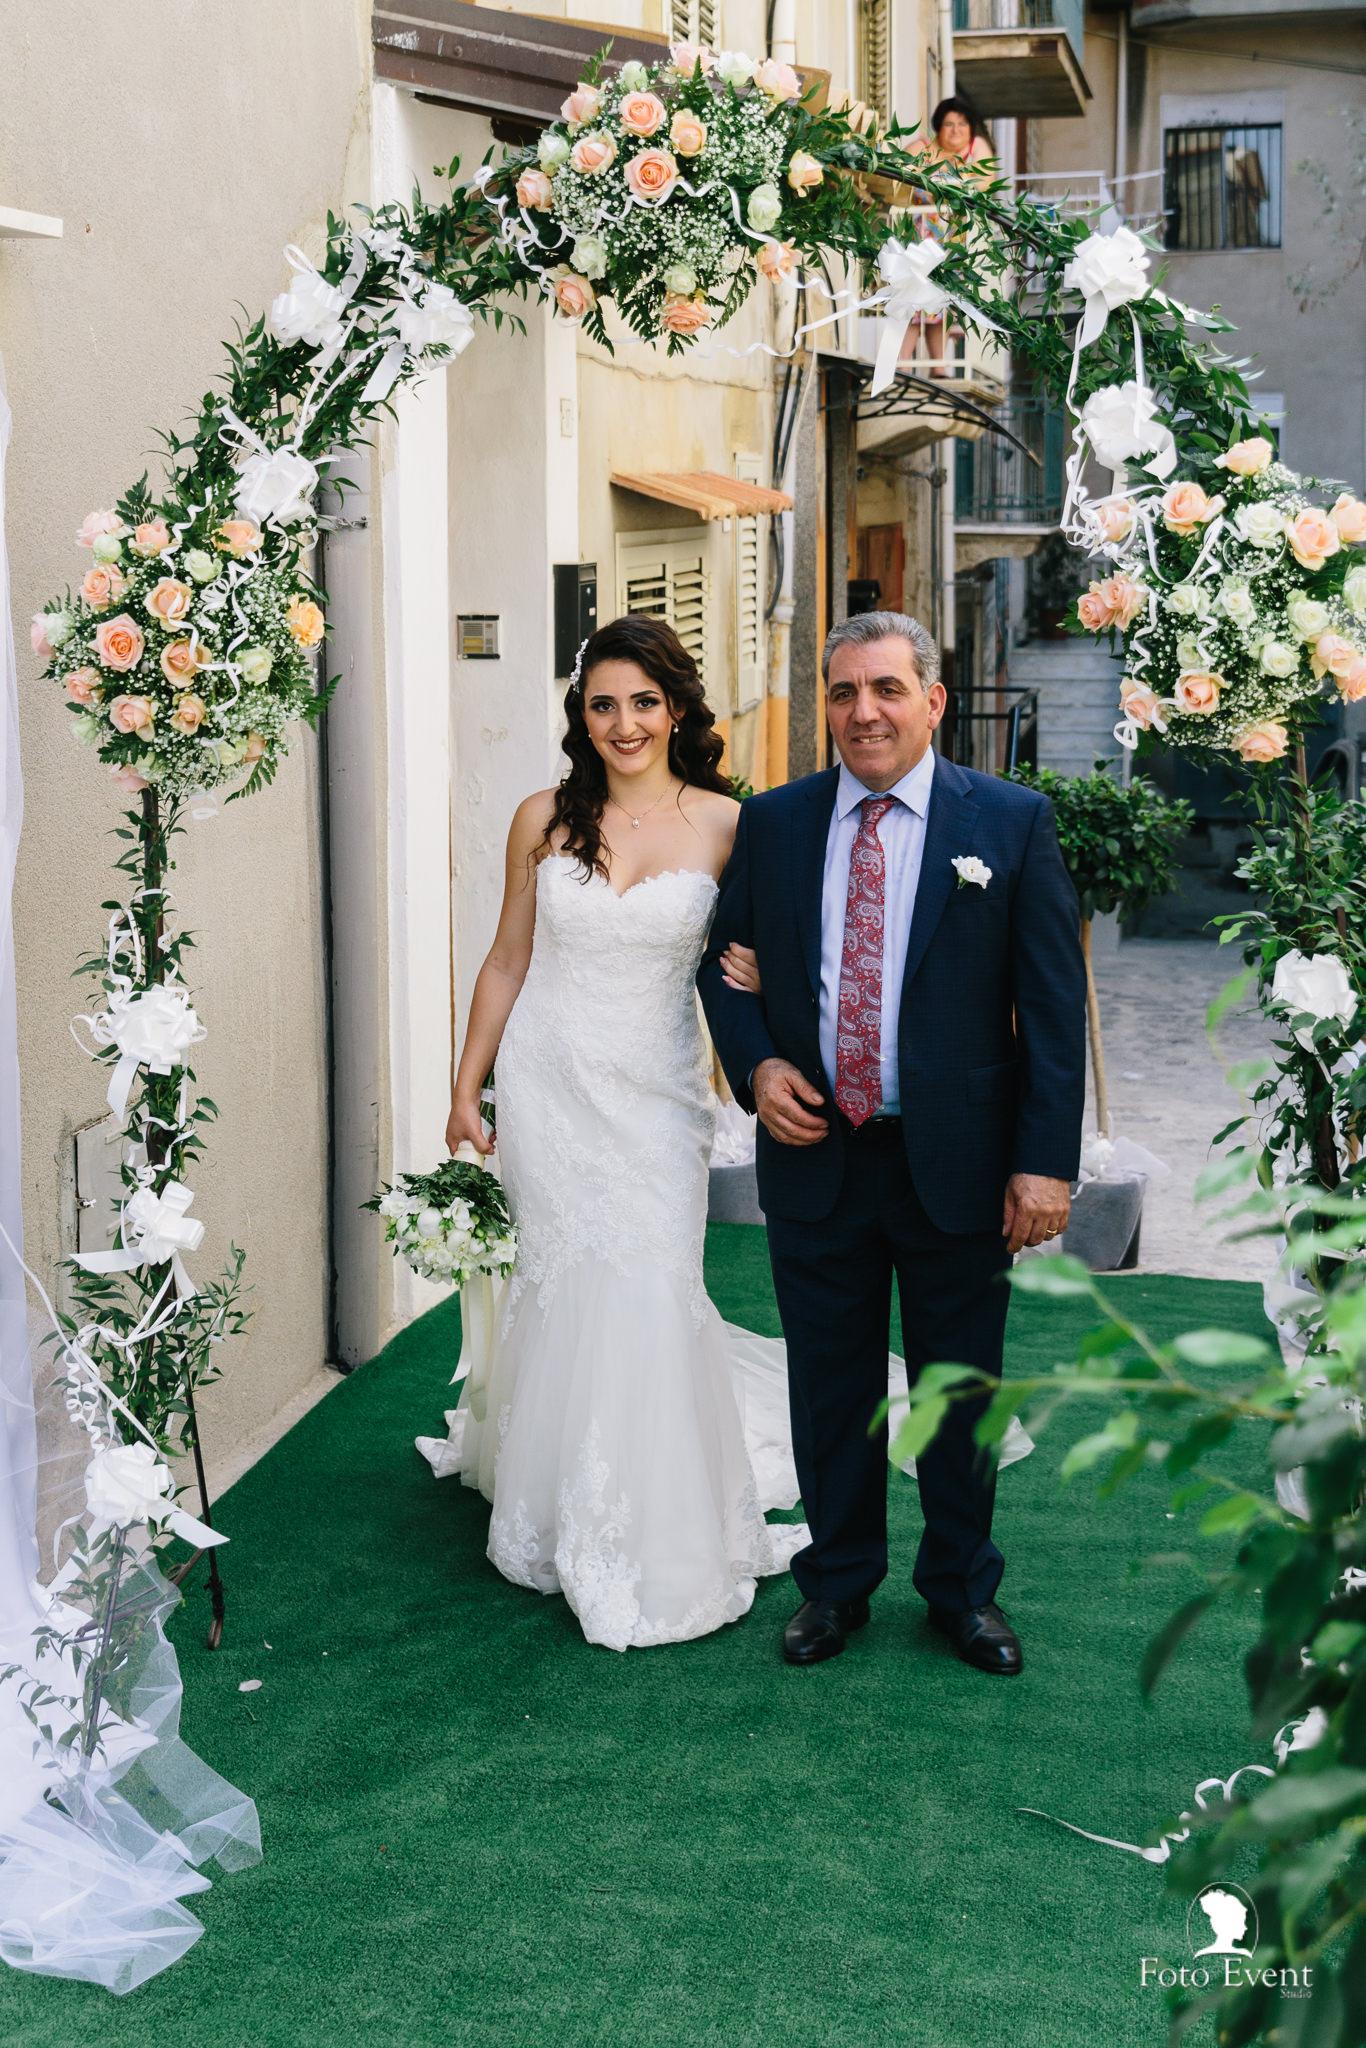 028-2019-08-31-Matrimonio-Serena-e-Saverio-Tarantino-5DE-972